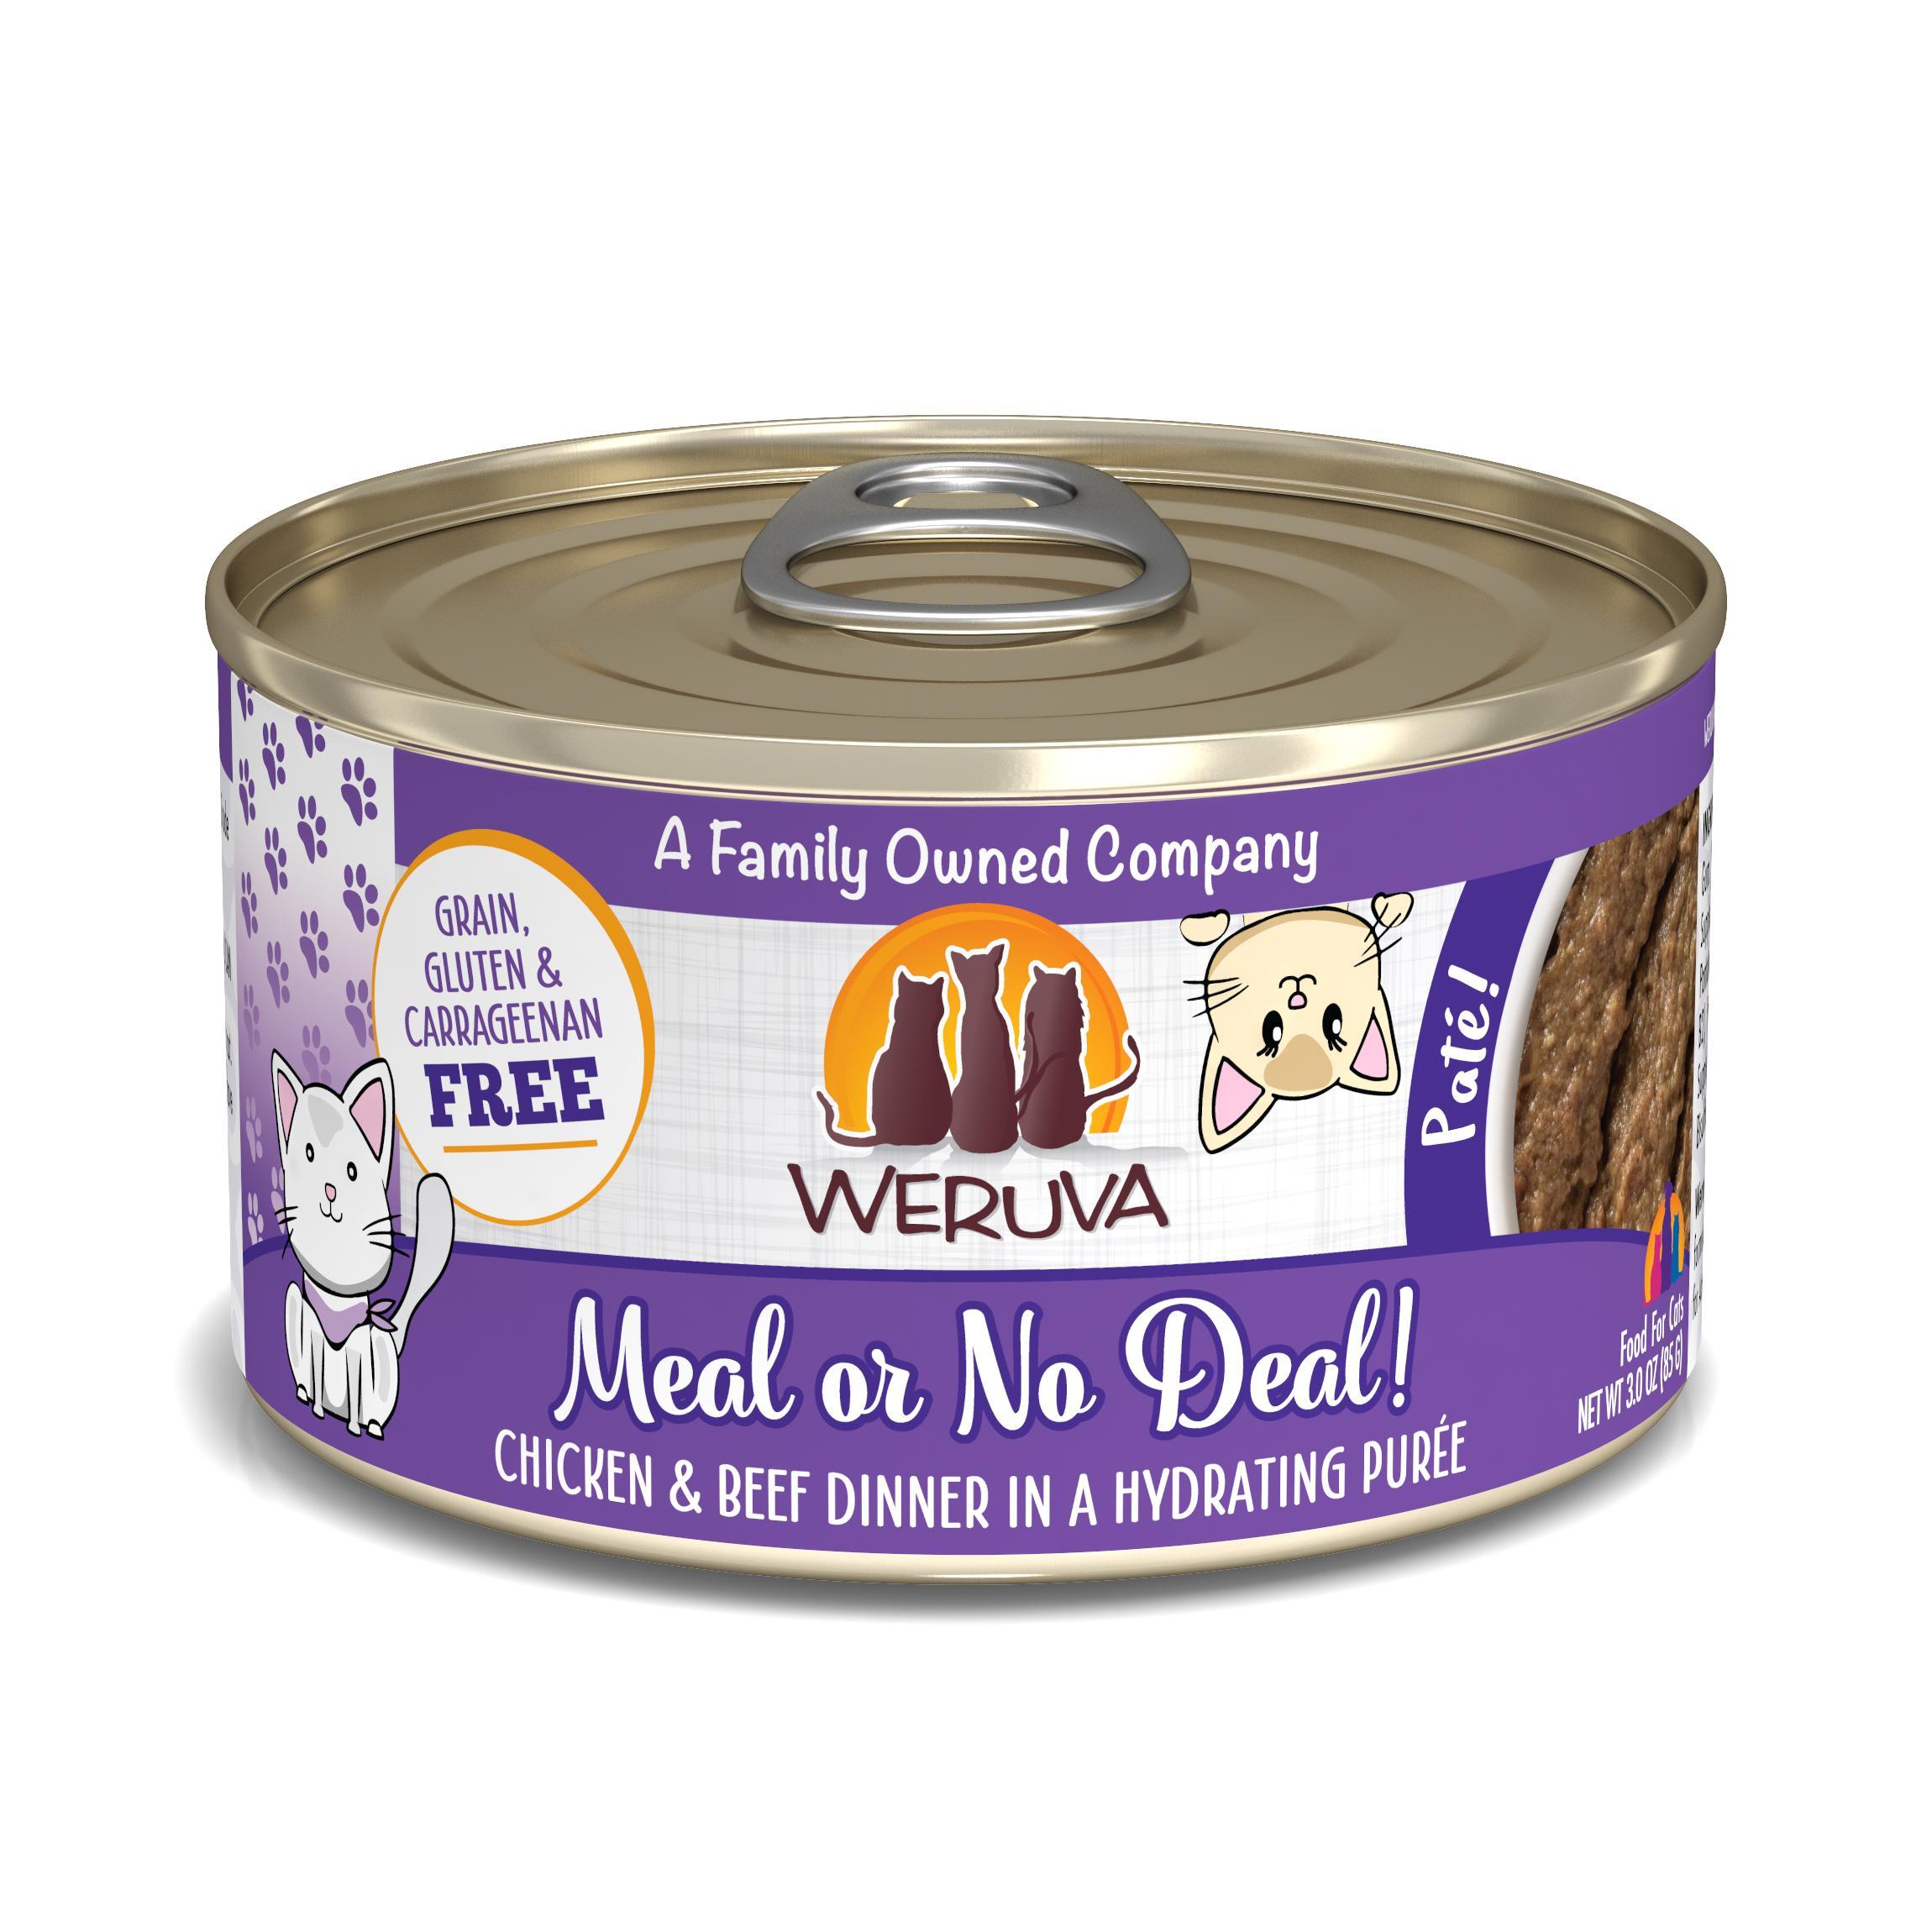 Weruva Cat Pate Meal or No Deal! Chicken & Beef Dinner in Puree Wet Cat Food Image